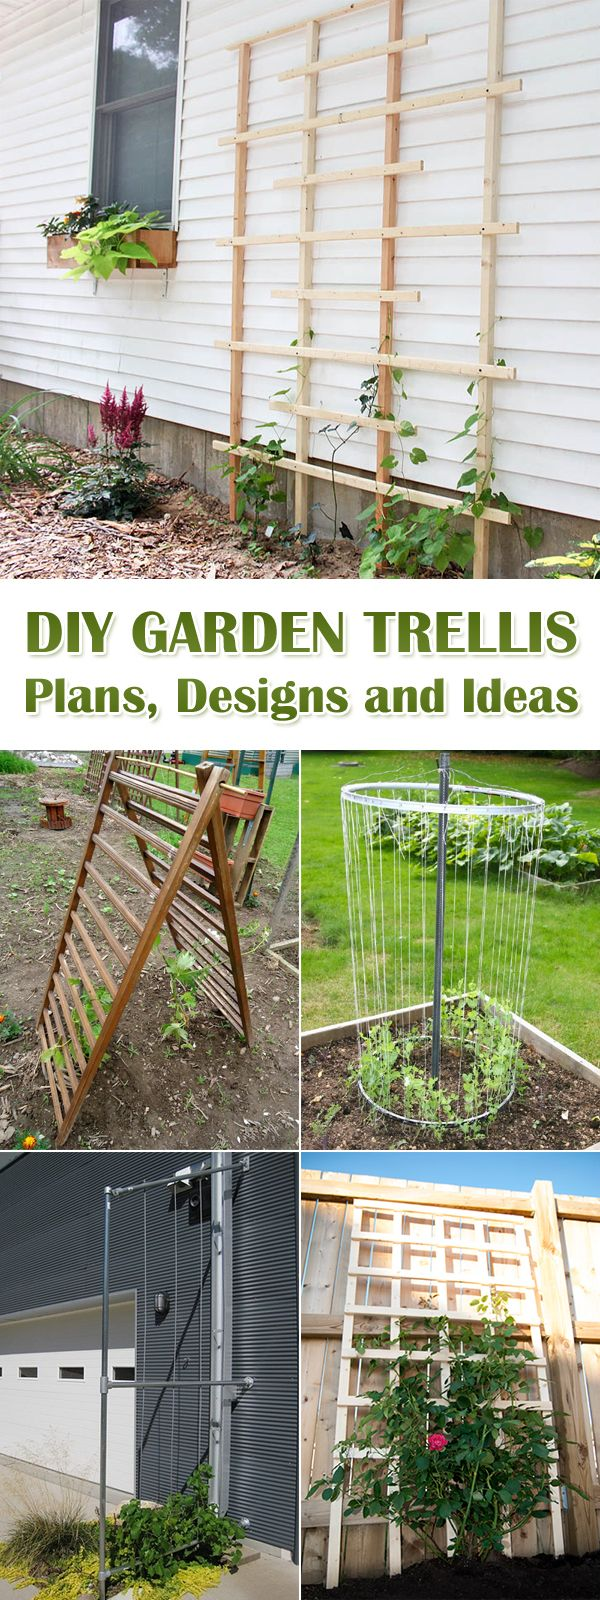 12 Diy Garden Trellis Plans Designs And Ideas Diy 400 x 300